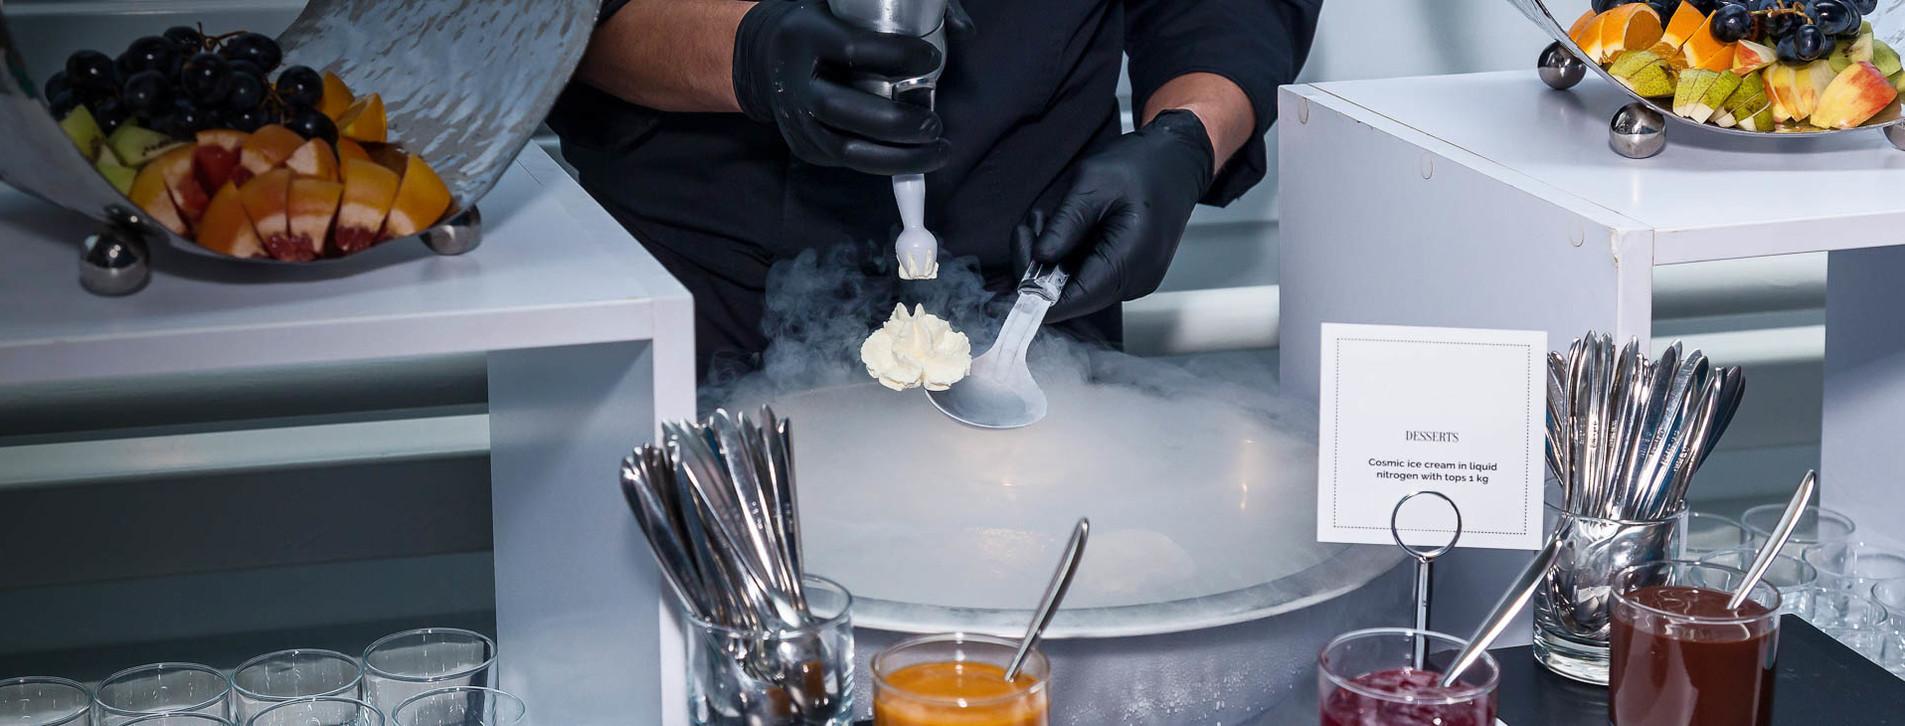 Фото 1 - Мастер-класс молекулярной кухни